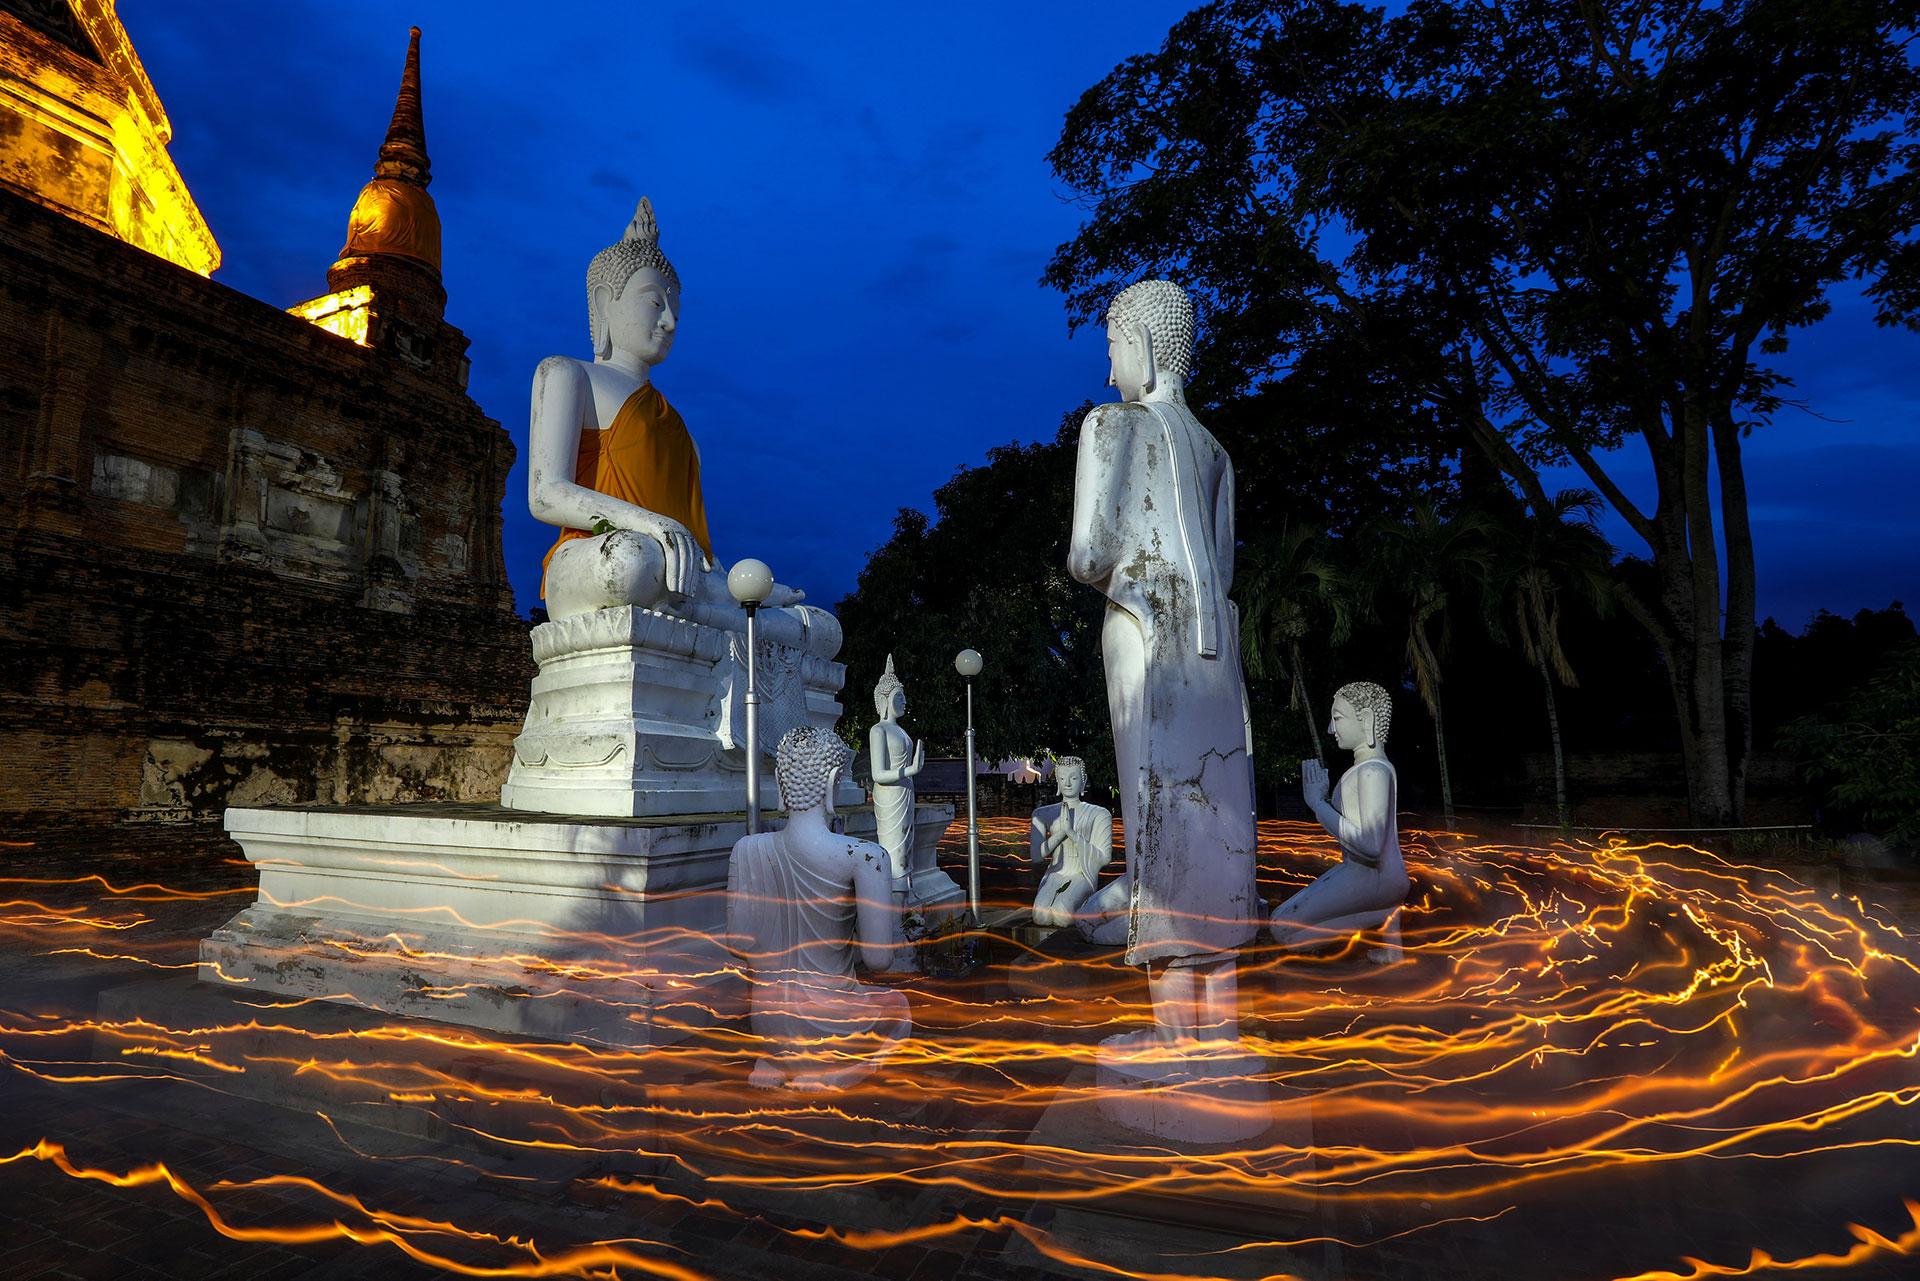 Monumento al Buda en el templo Chai Mongkhon en Ayutthaya, Tailandia (Reuters)